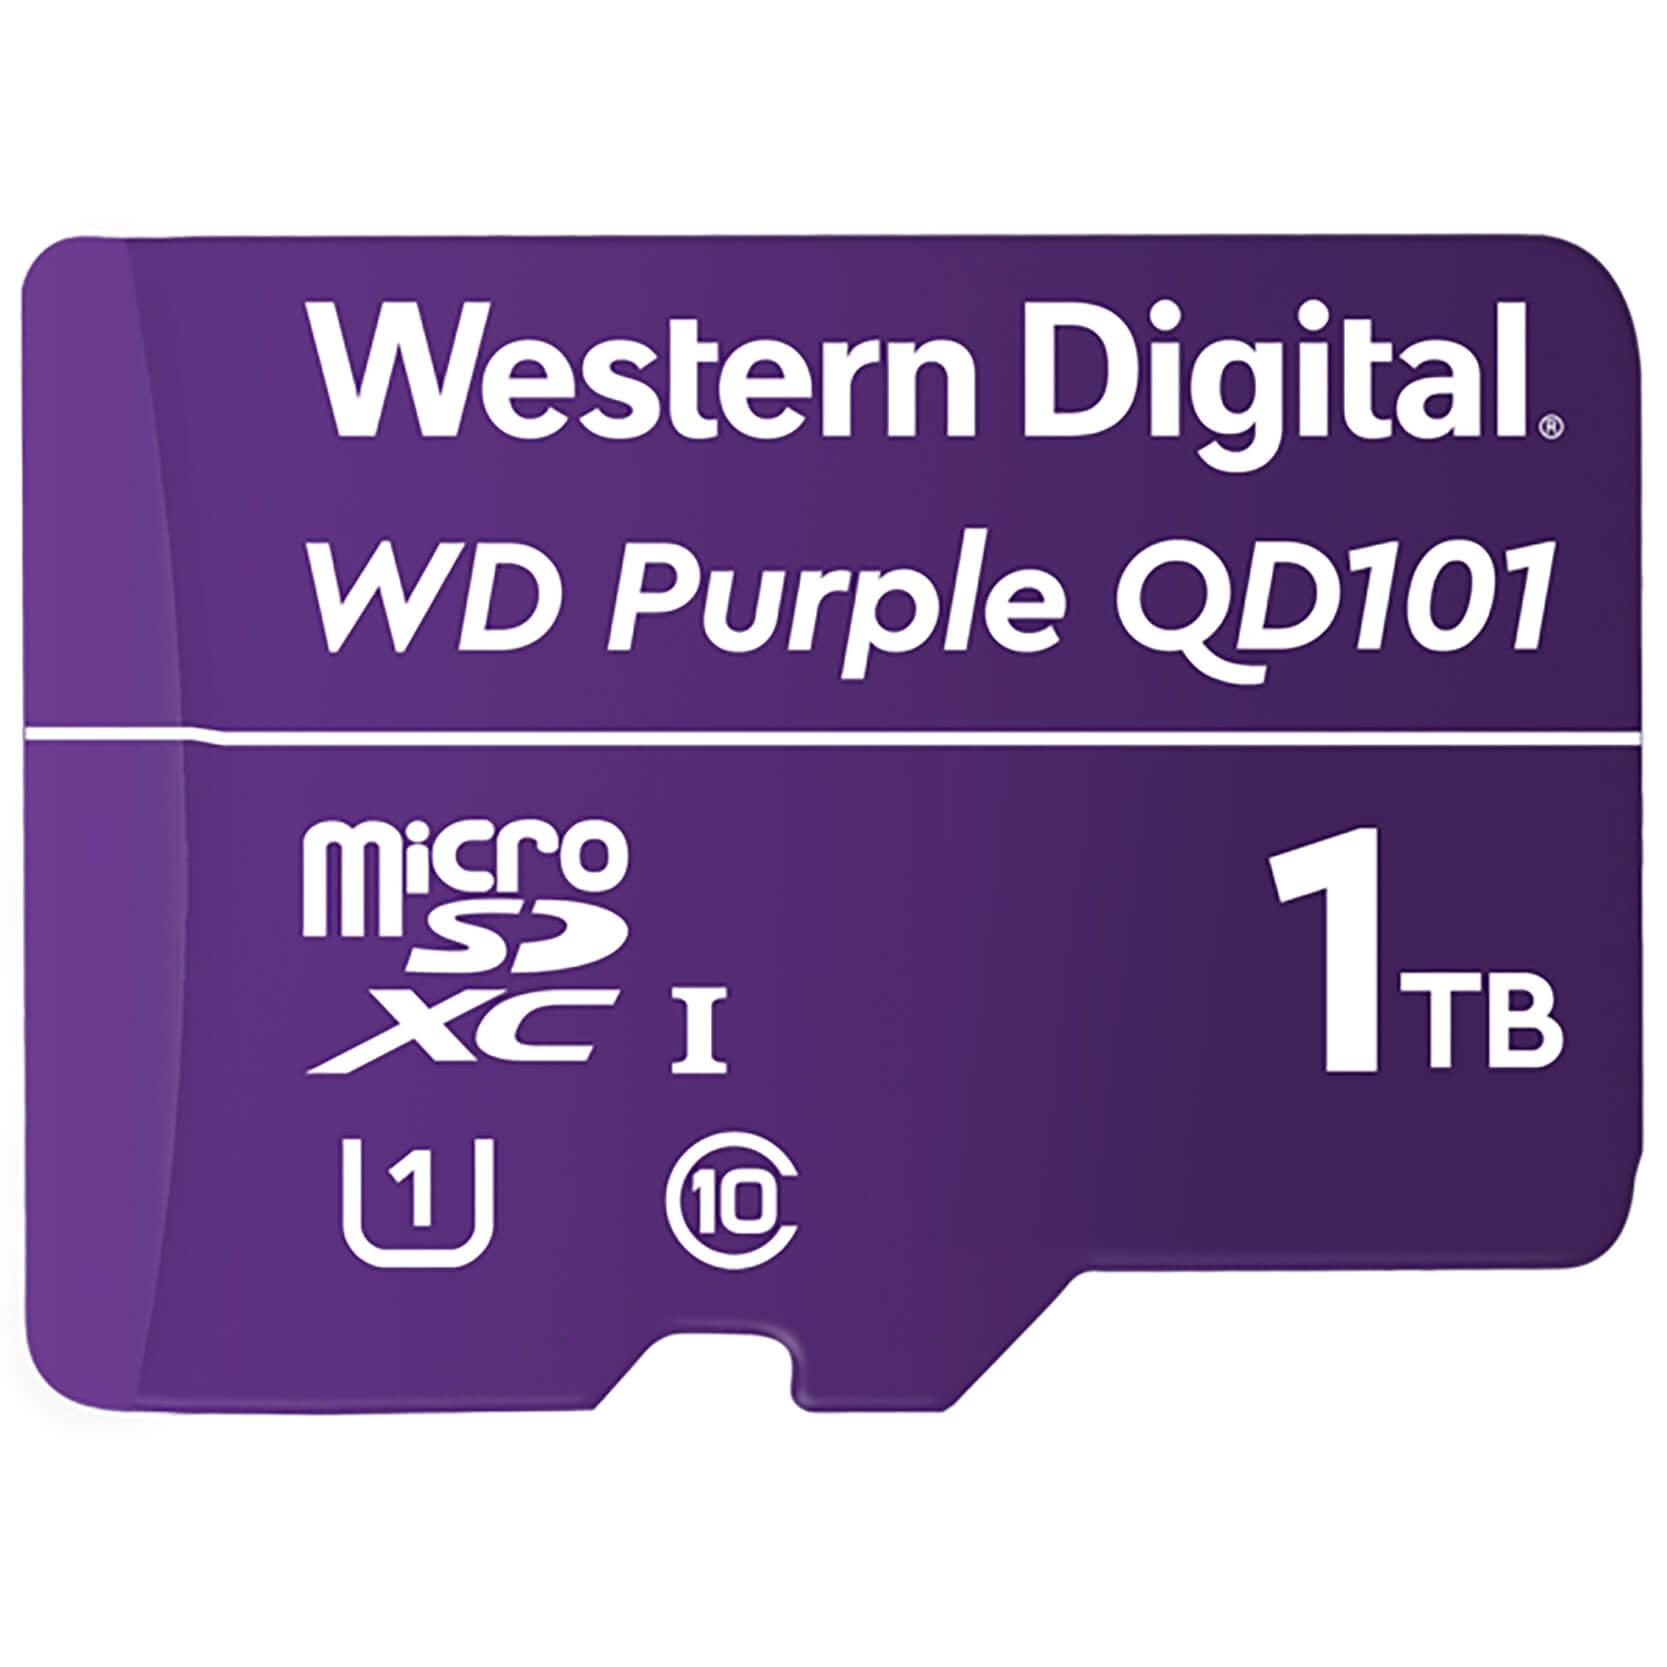 WD Purple microSD Front 1TB 600x600 1